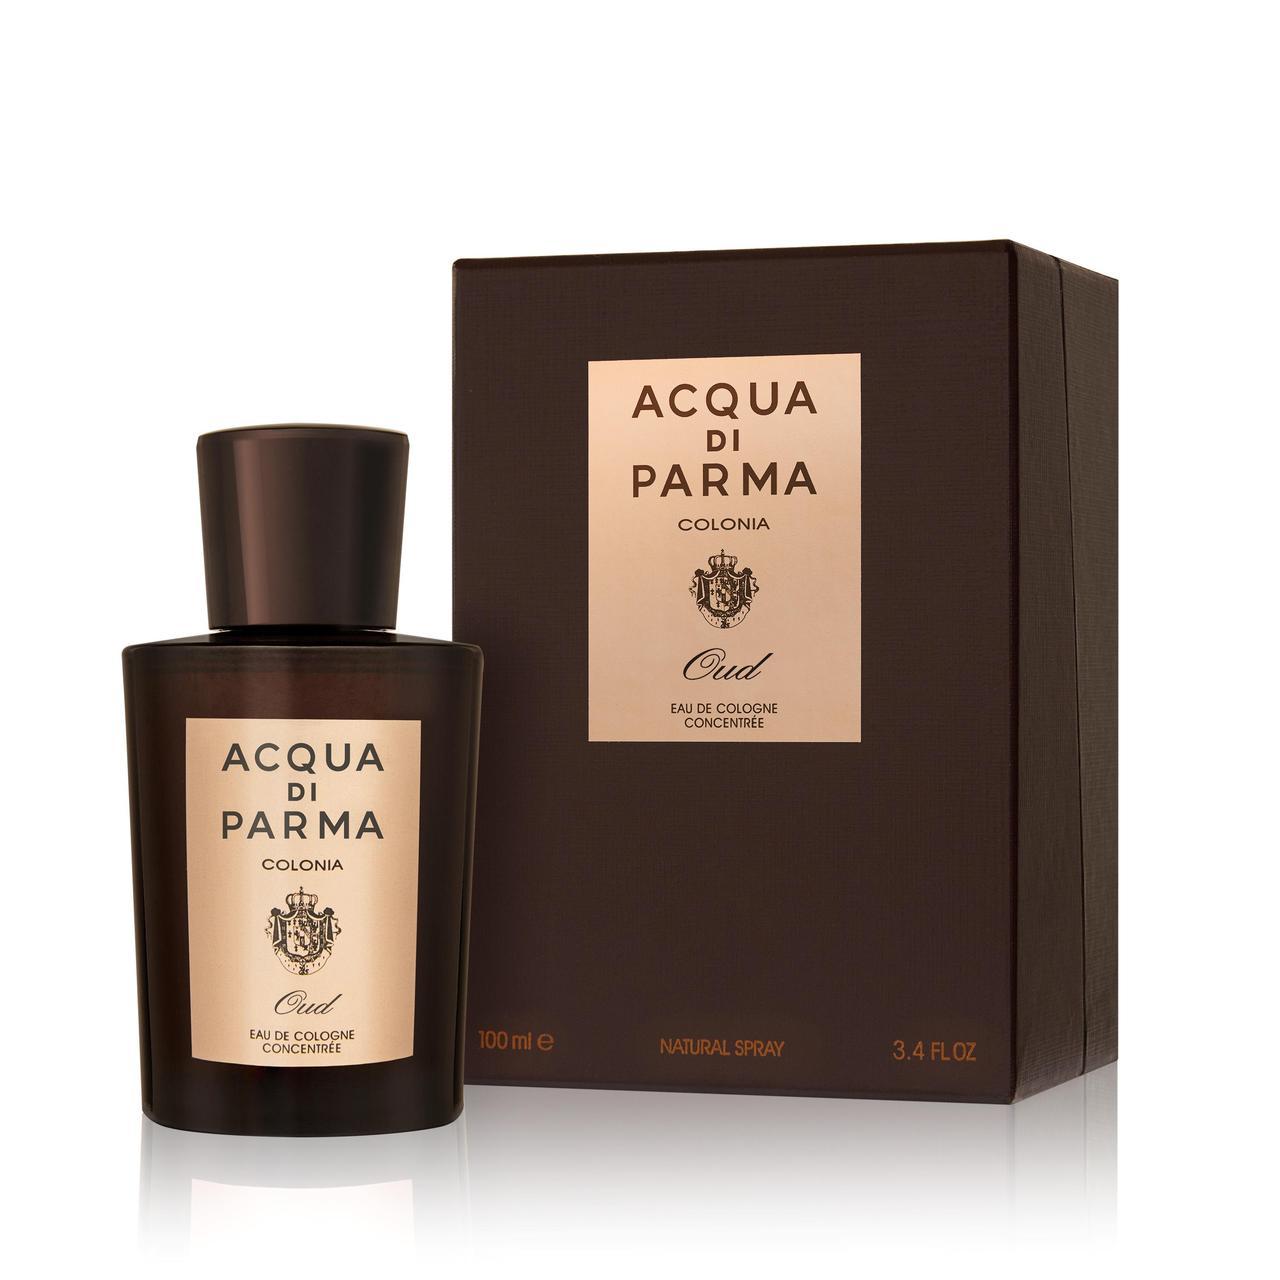 Acqua di parma Colonia Oud - £89 (possibly cheaper) delivered for a 100ml at Fabled